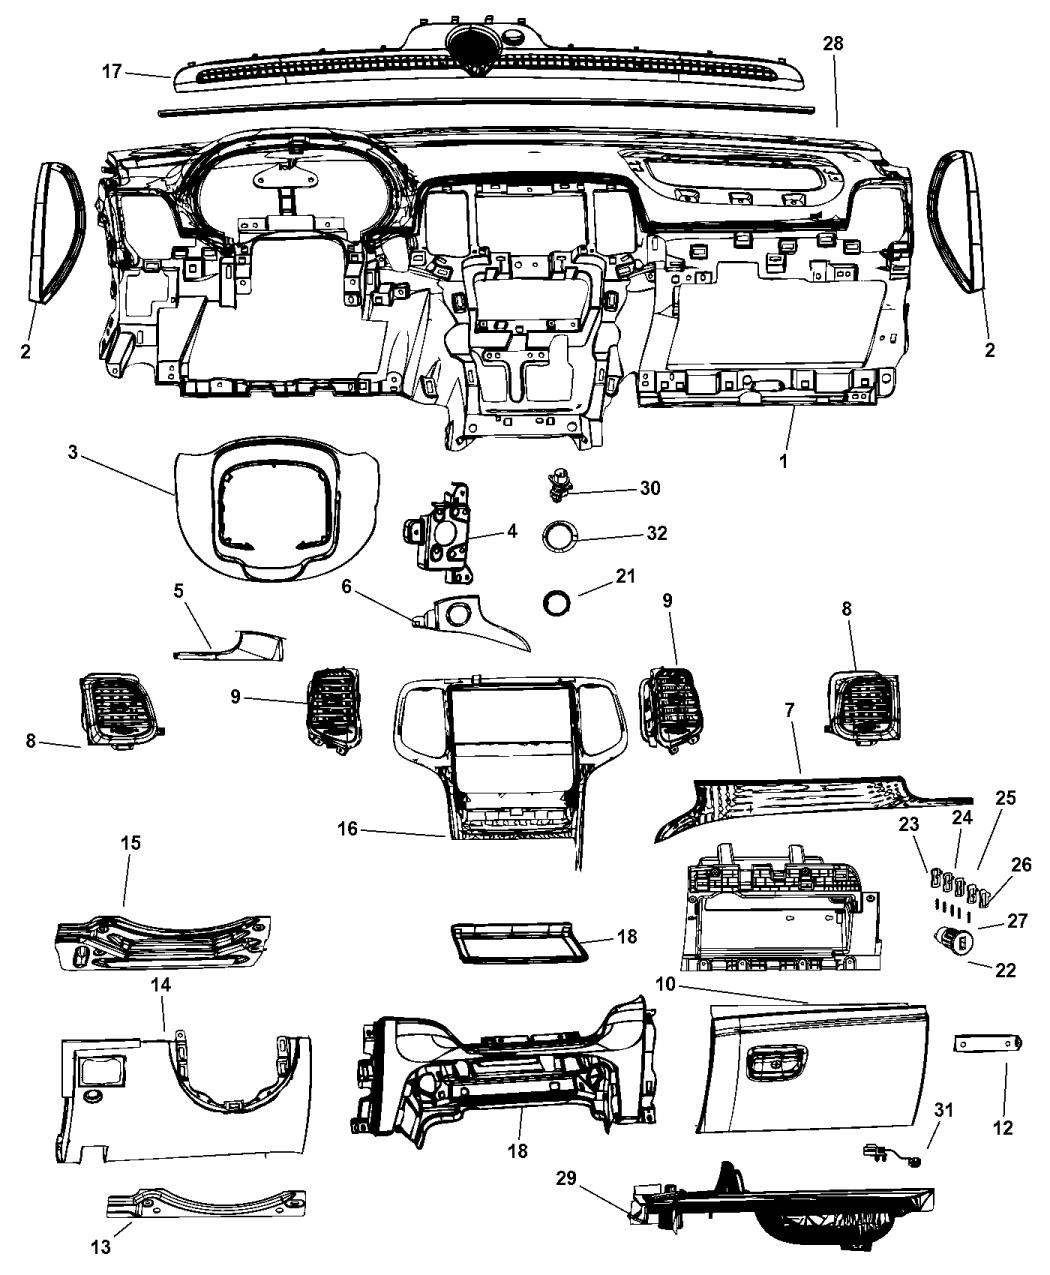 2014 Dodge Durango Parts Diagram • Wiring Diagram For Free